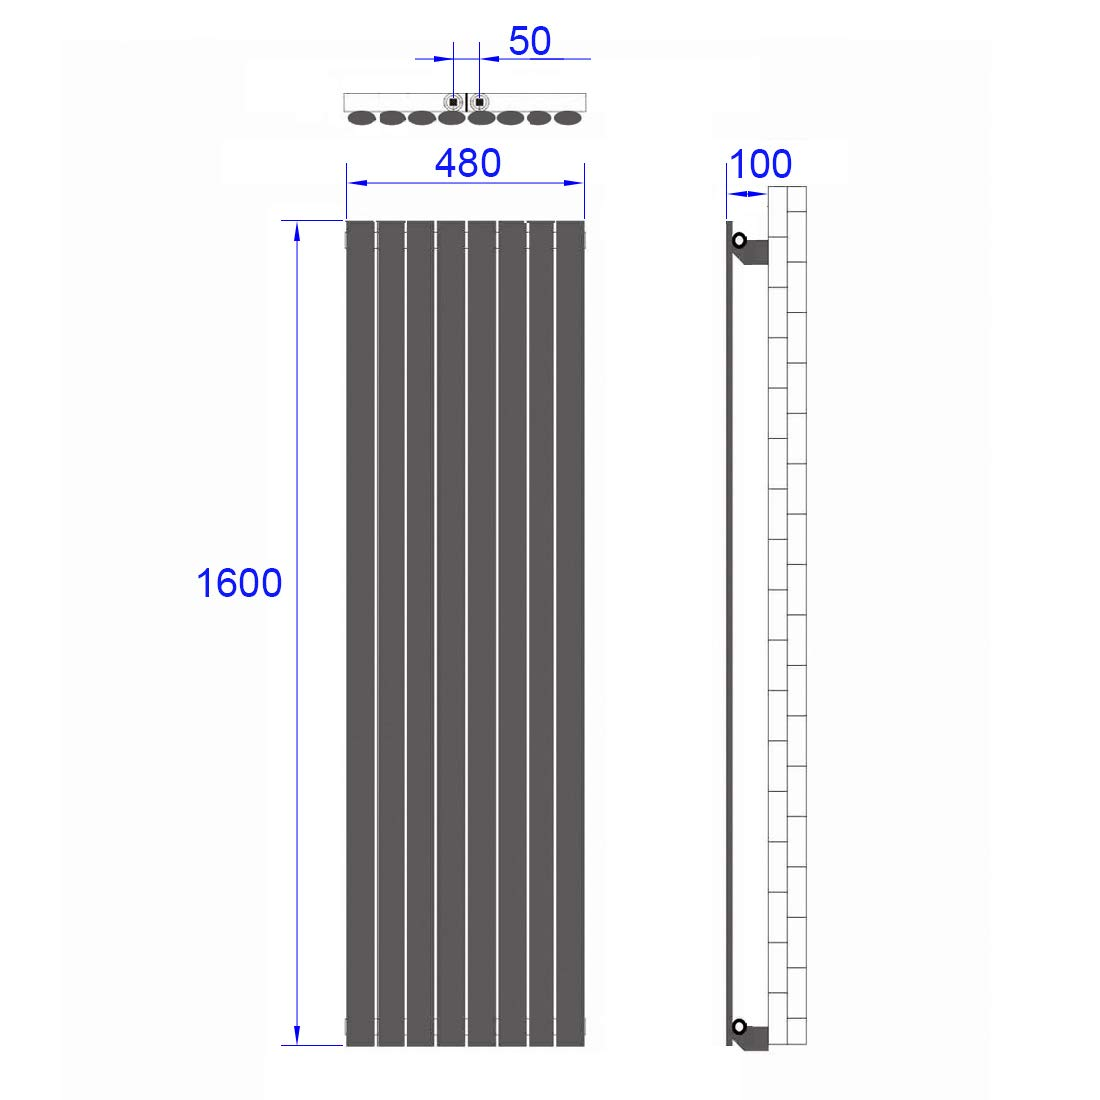 Design Oval Heizk/örper Vertikal Heizk/örper Antrazit 1800 x 600 mm Heizung Mittelanschluss Doppellagig